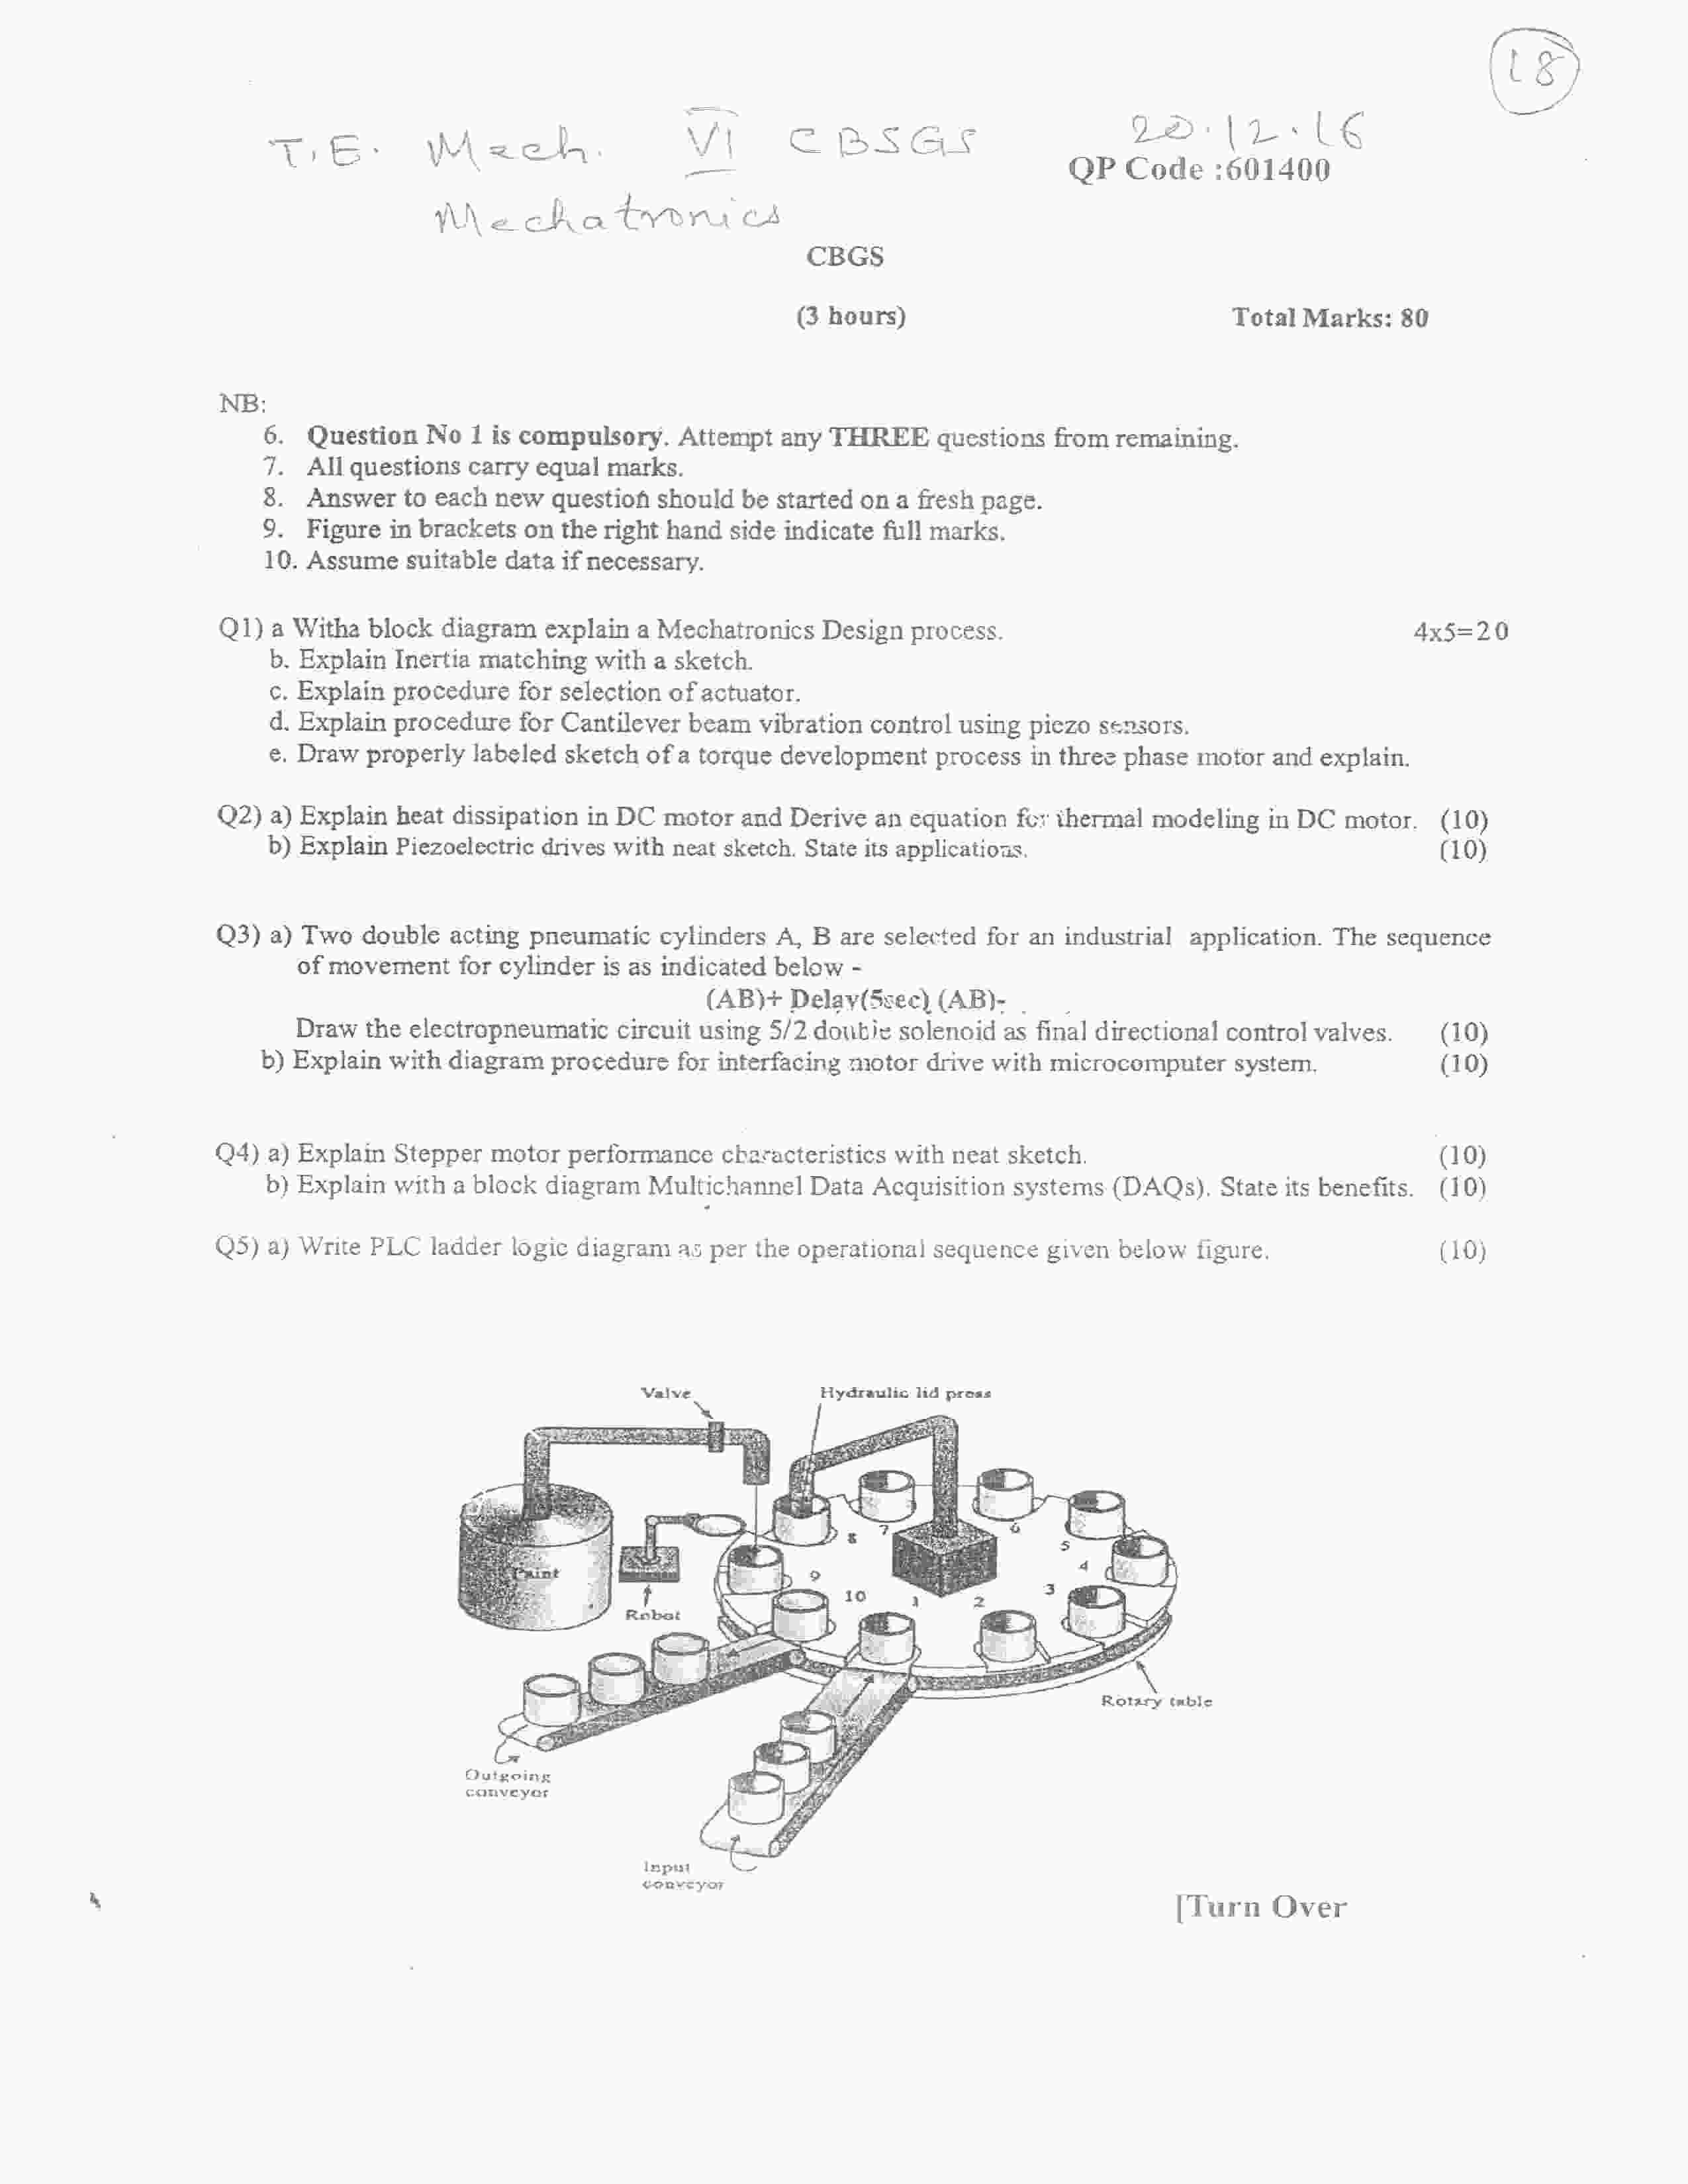 Mechatronics question paper dec 2016 mechanical engineering mechatronics question paper dec 2016 mechanical engineering semester 6 mumbai university malvernweather Gallery